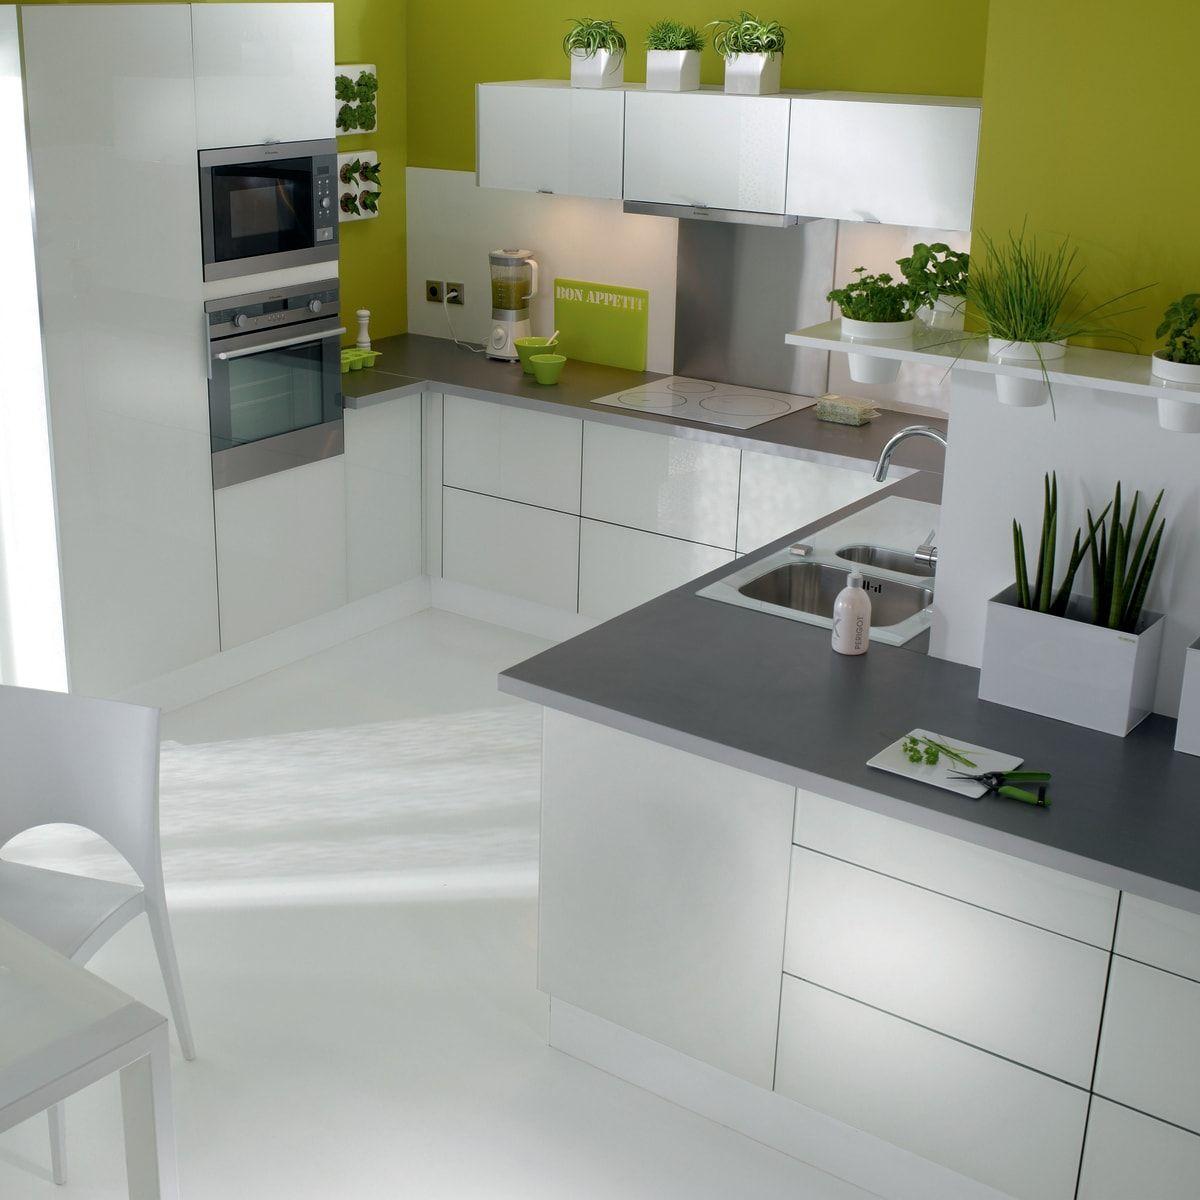 Cucine componibili prezzi e offerte Leroy Merlin Cucina